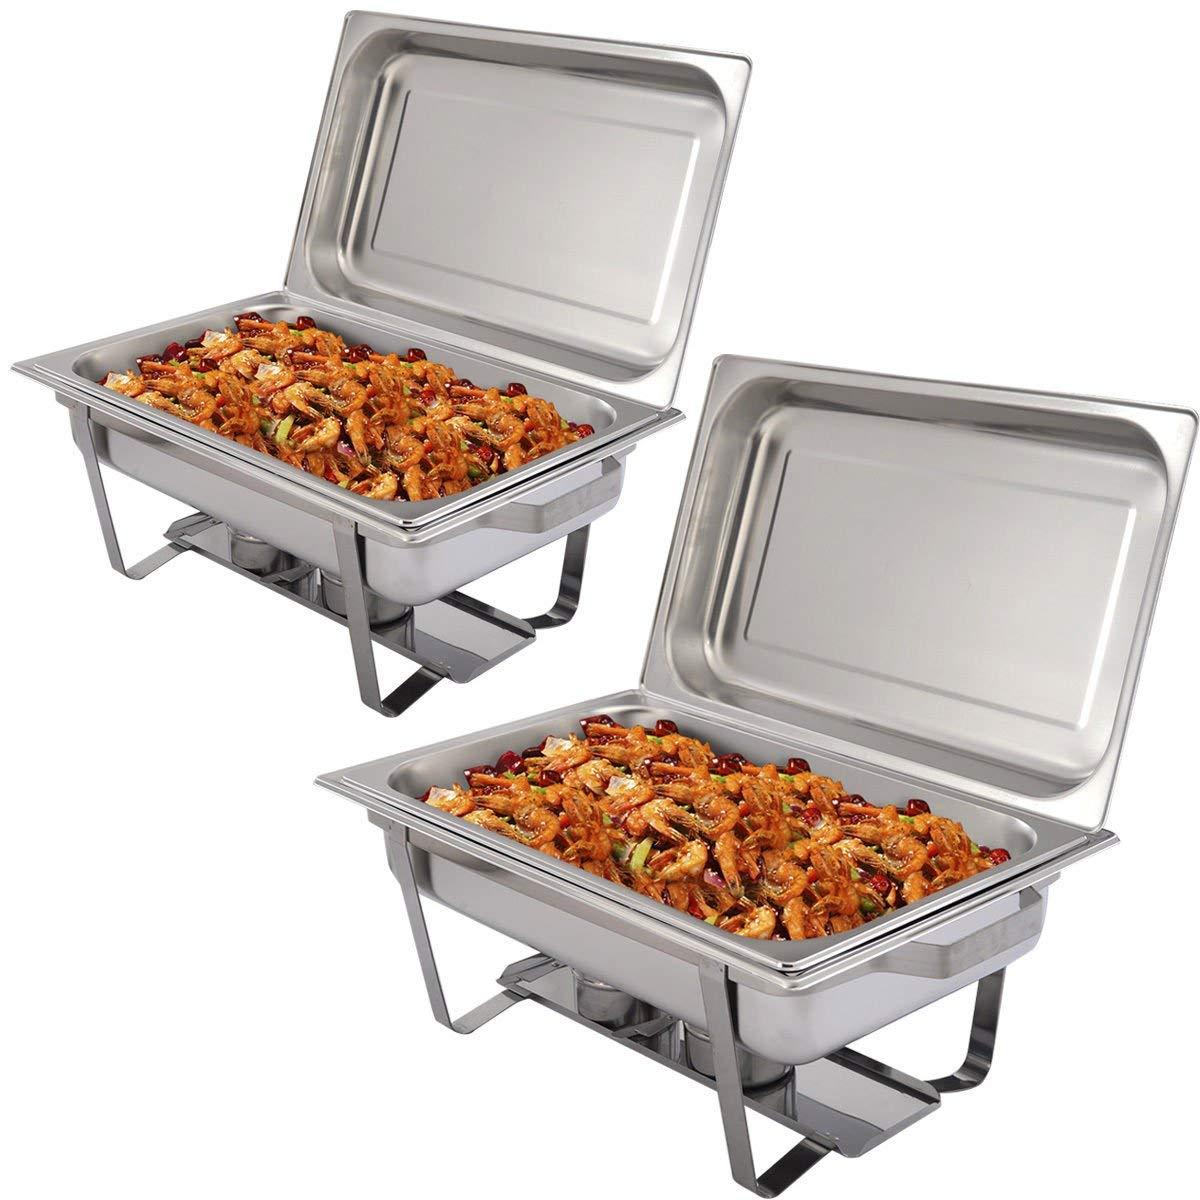 2 Packs of 9 Quart Stainless Steel Rectangular Chafing Dish Full Size